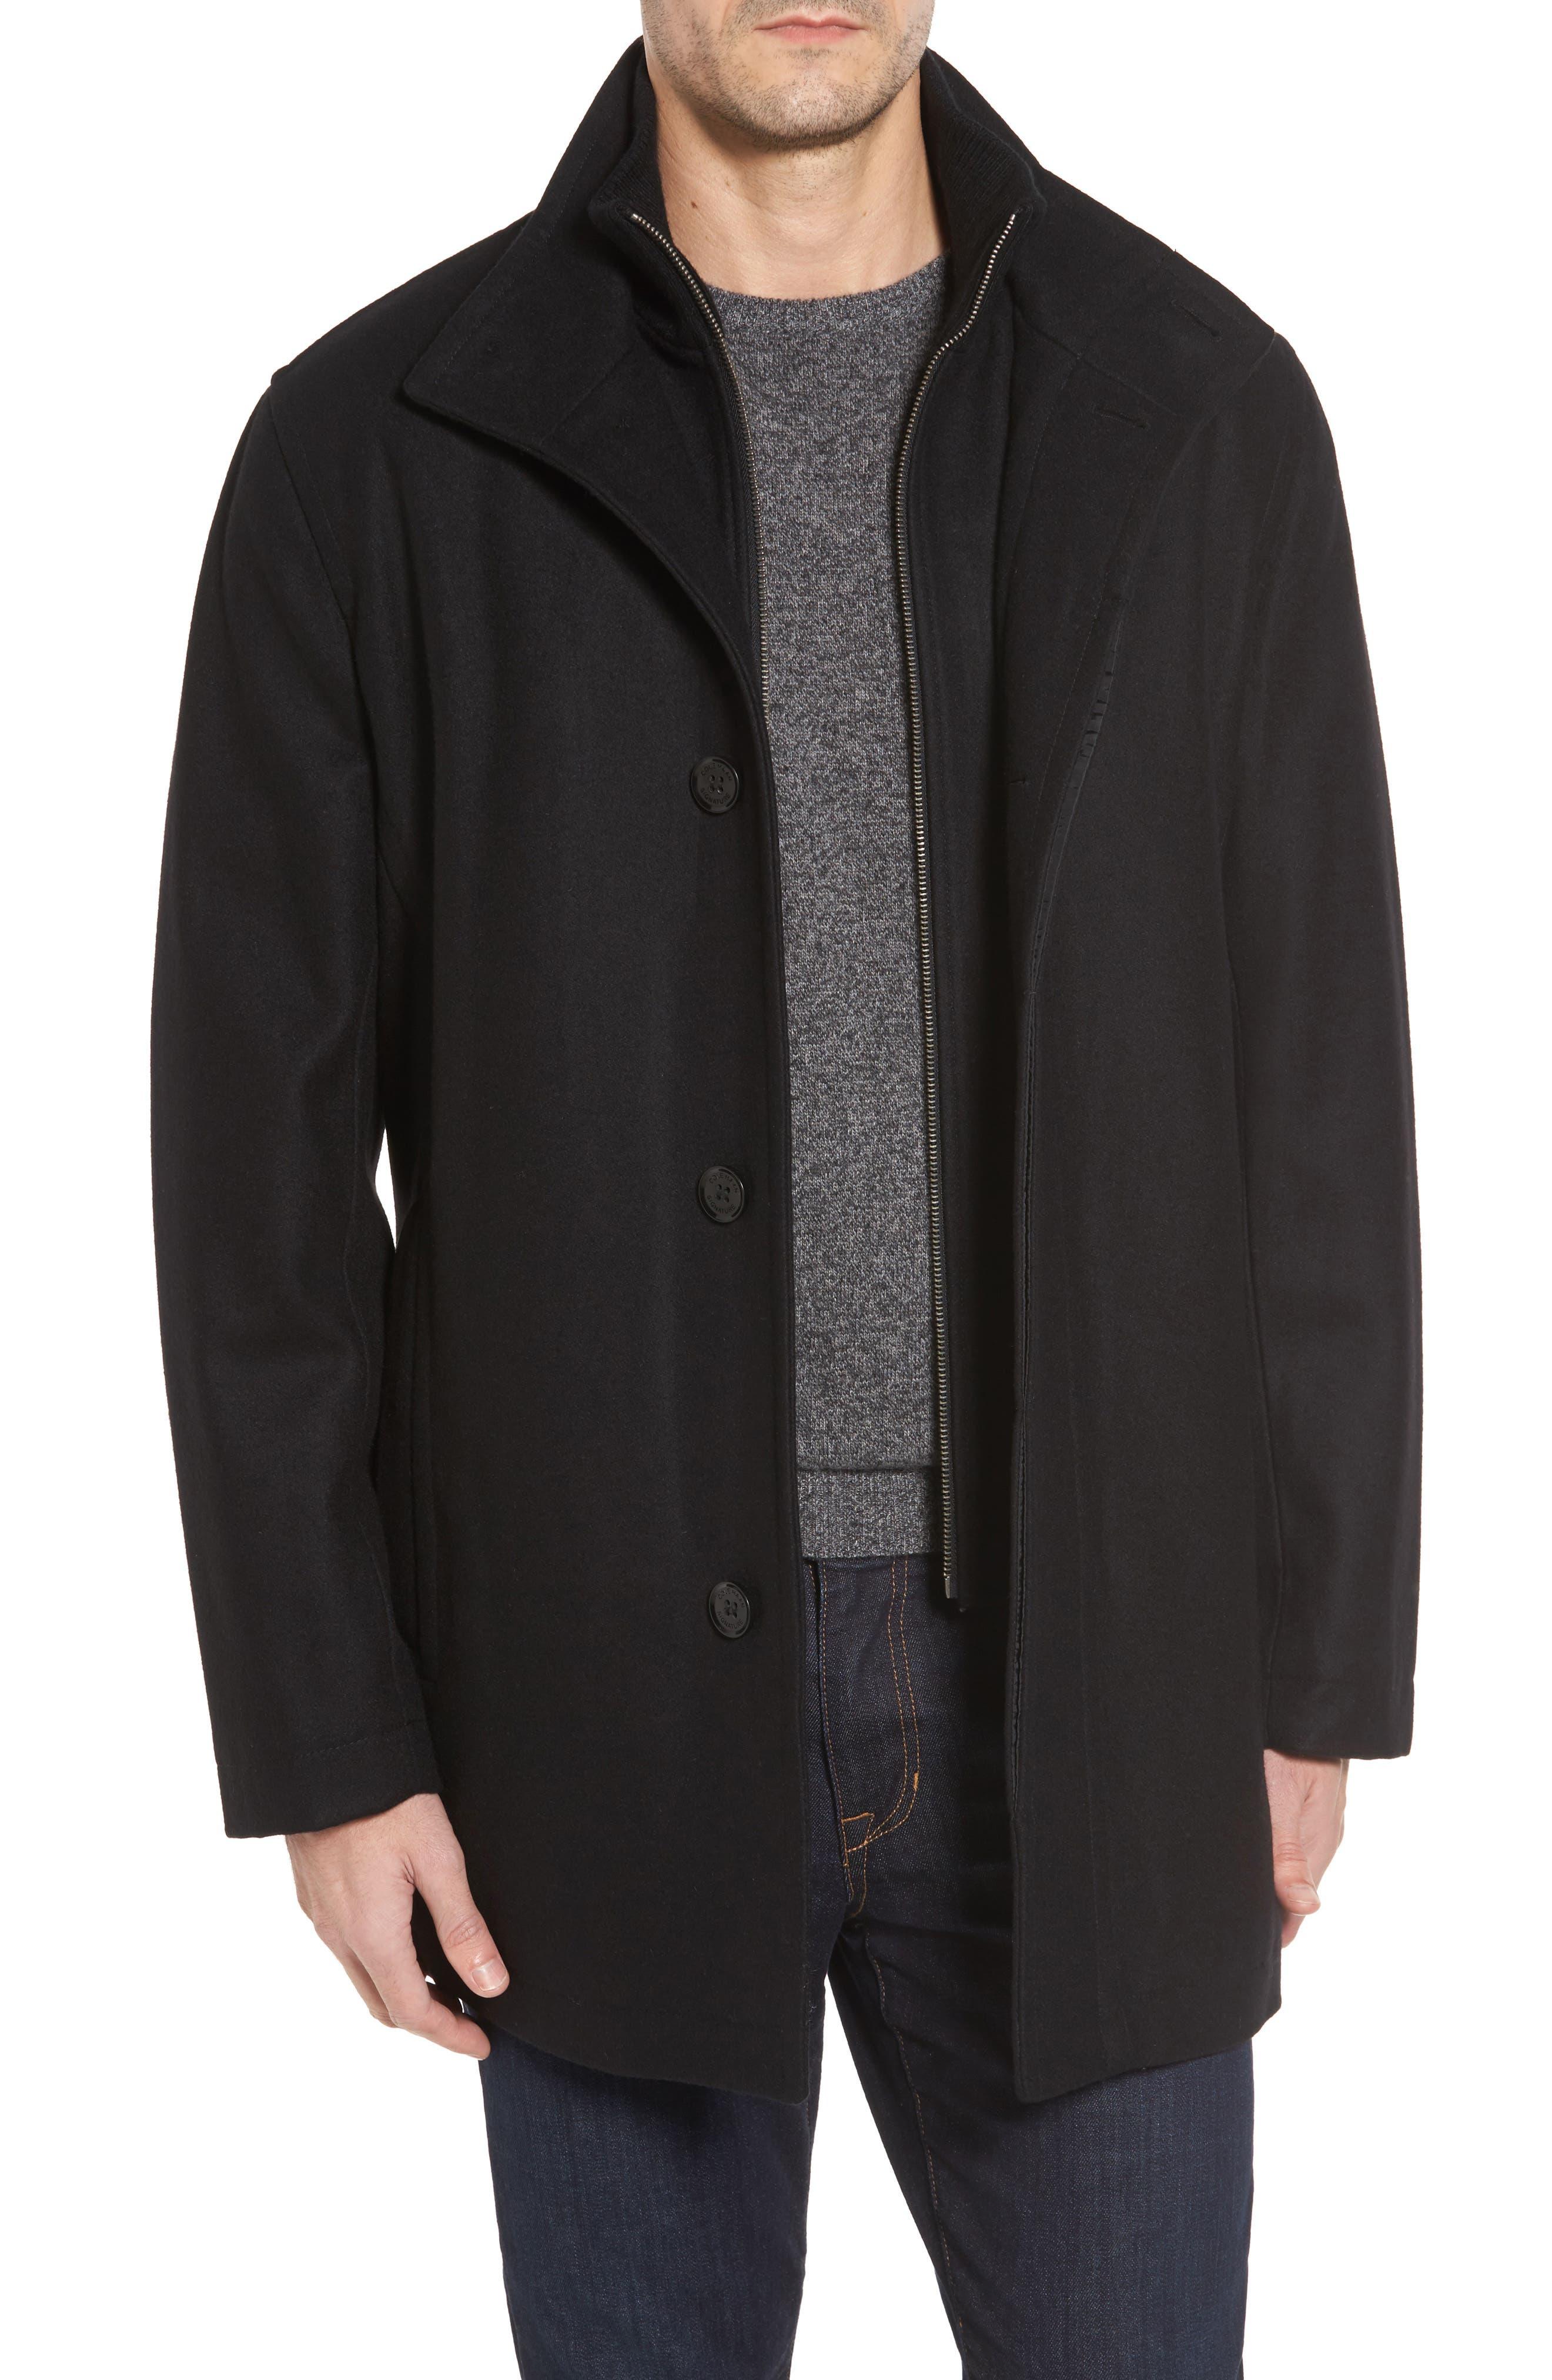 Melton Wool Blend Coat,                         Main,                         color, Black